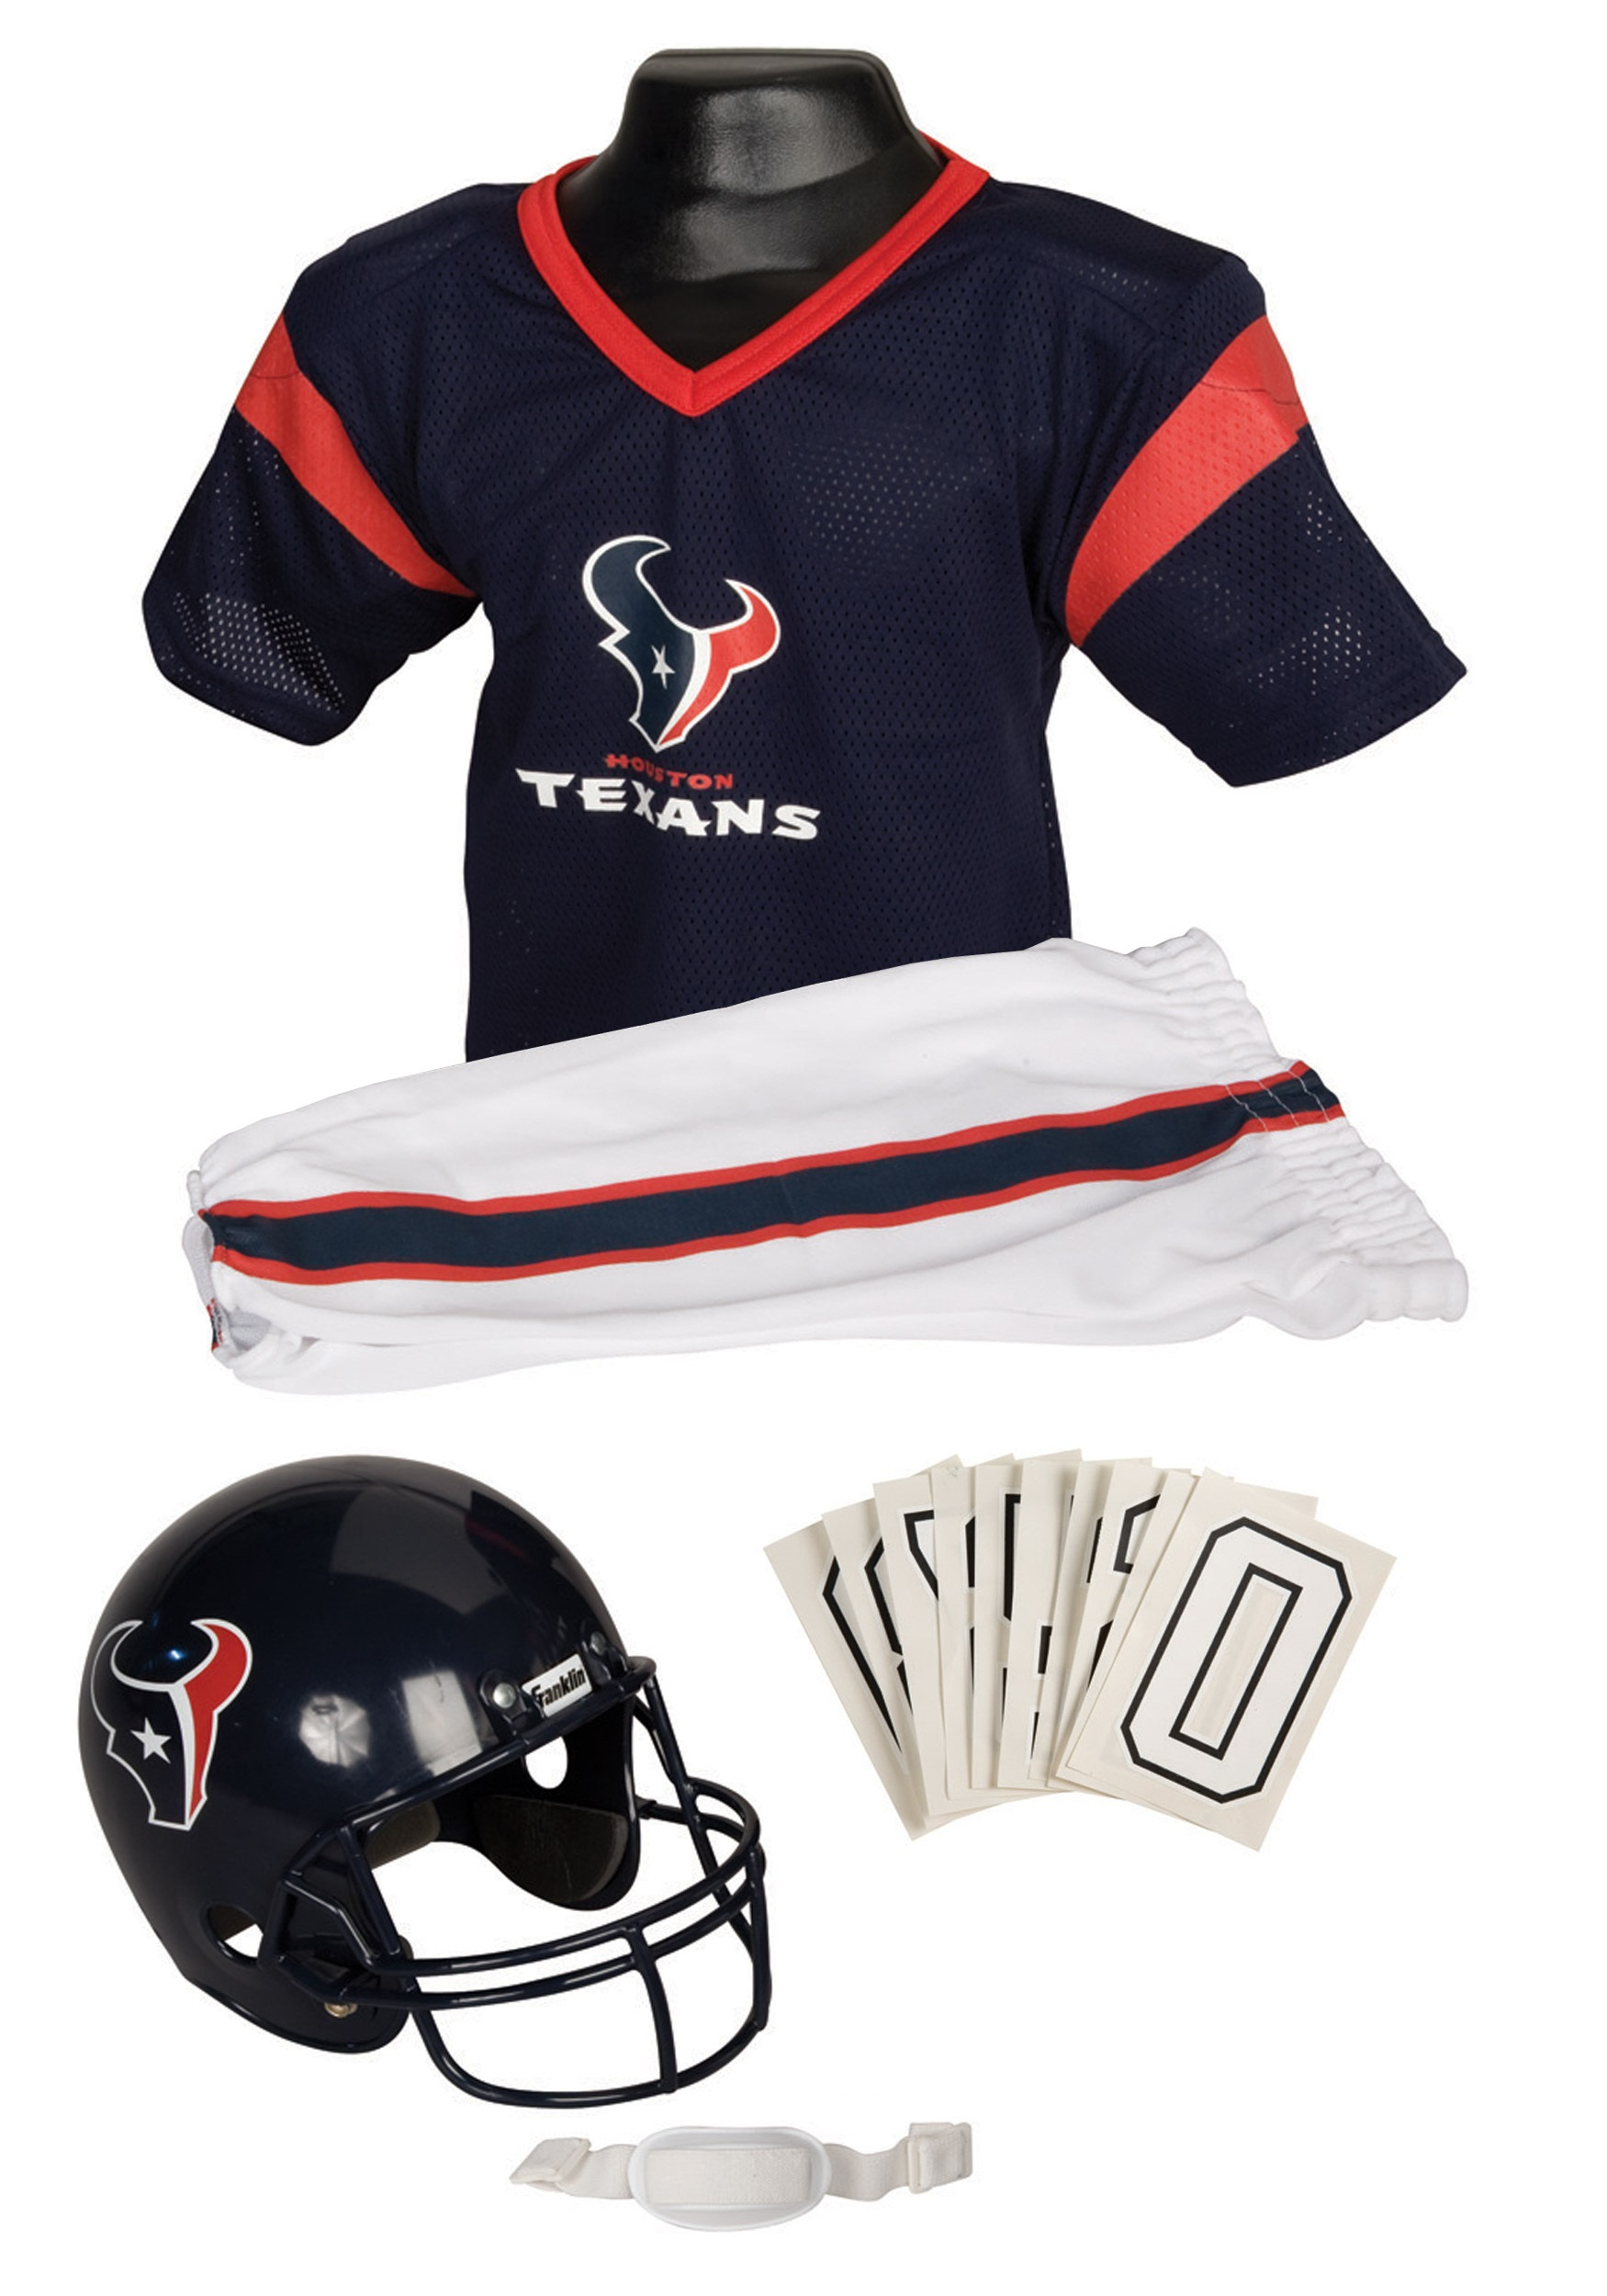 446e462b0ed Kids Texans NFL Uniform Costume